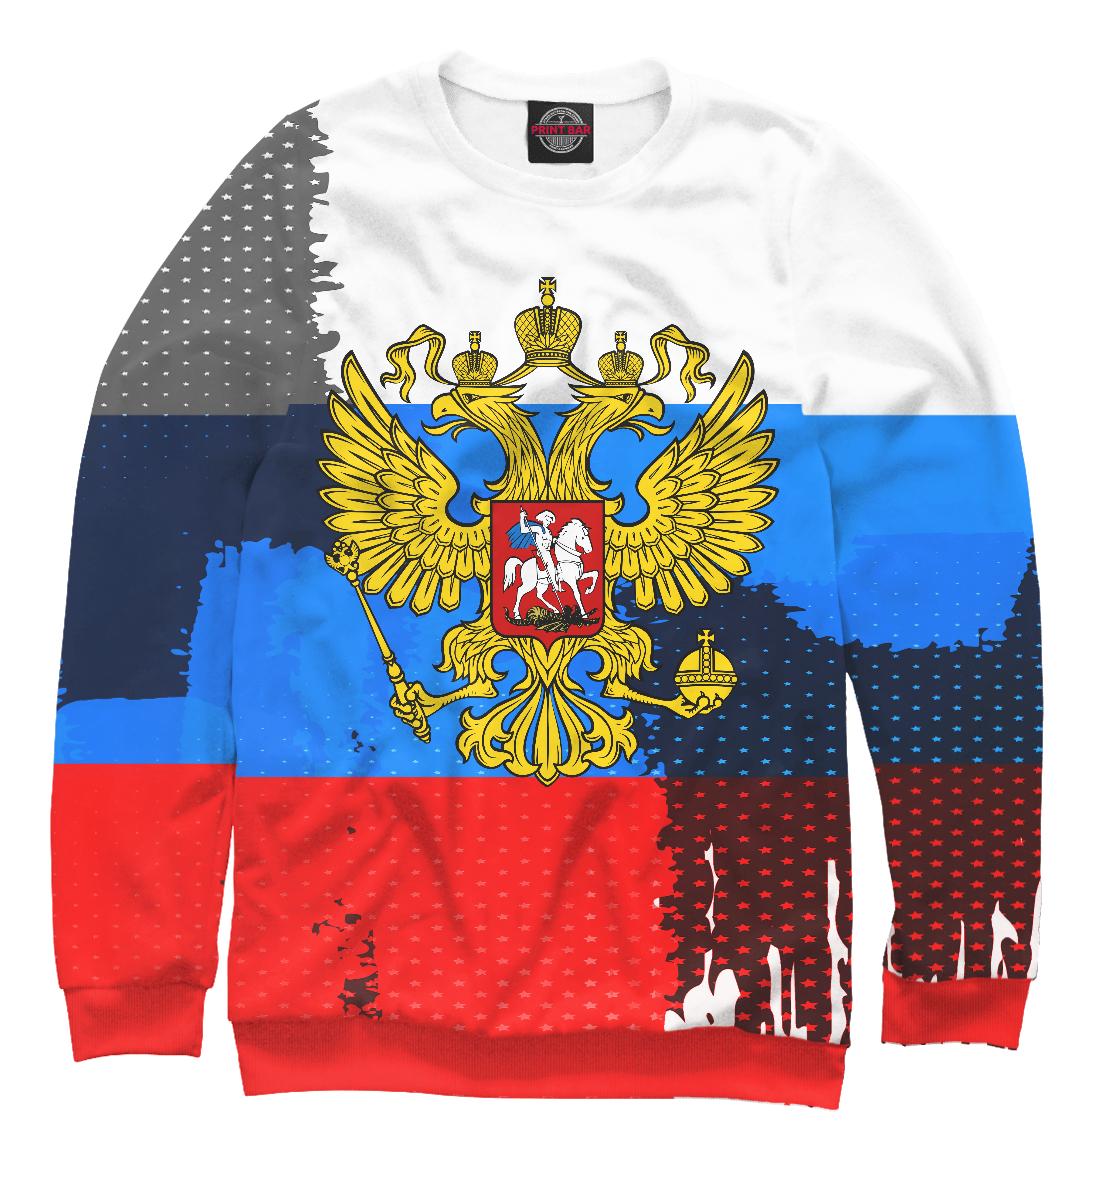 Купить Россия триколор, Printbar, Свитшоты, SRF-926777-swi-1